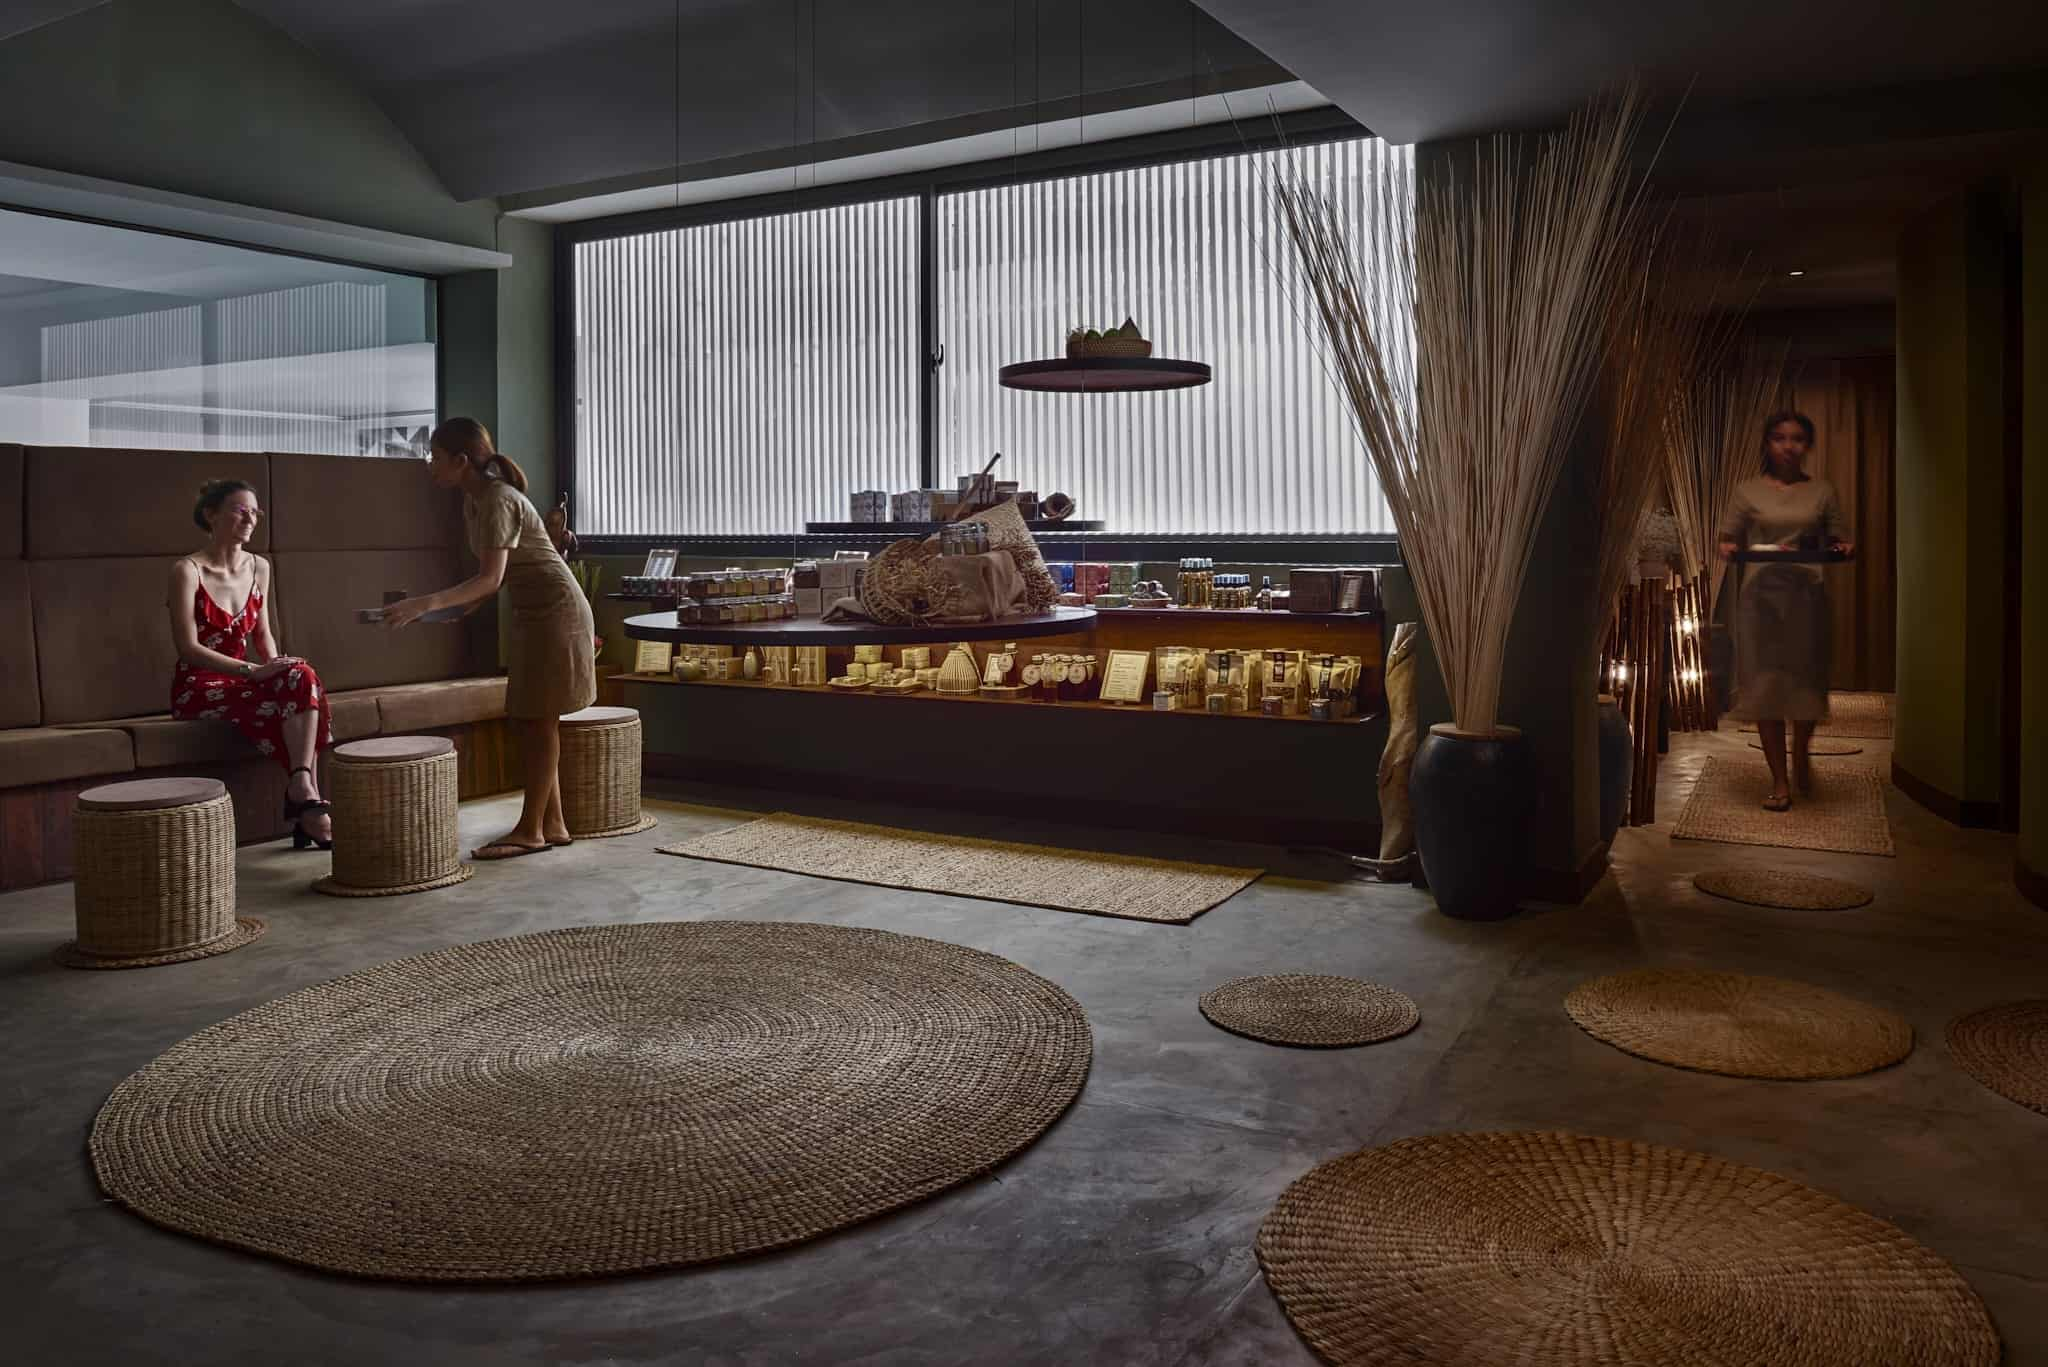 Baitong_Spa_by_Bodia_VIP_Room-